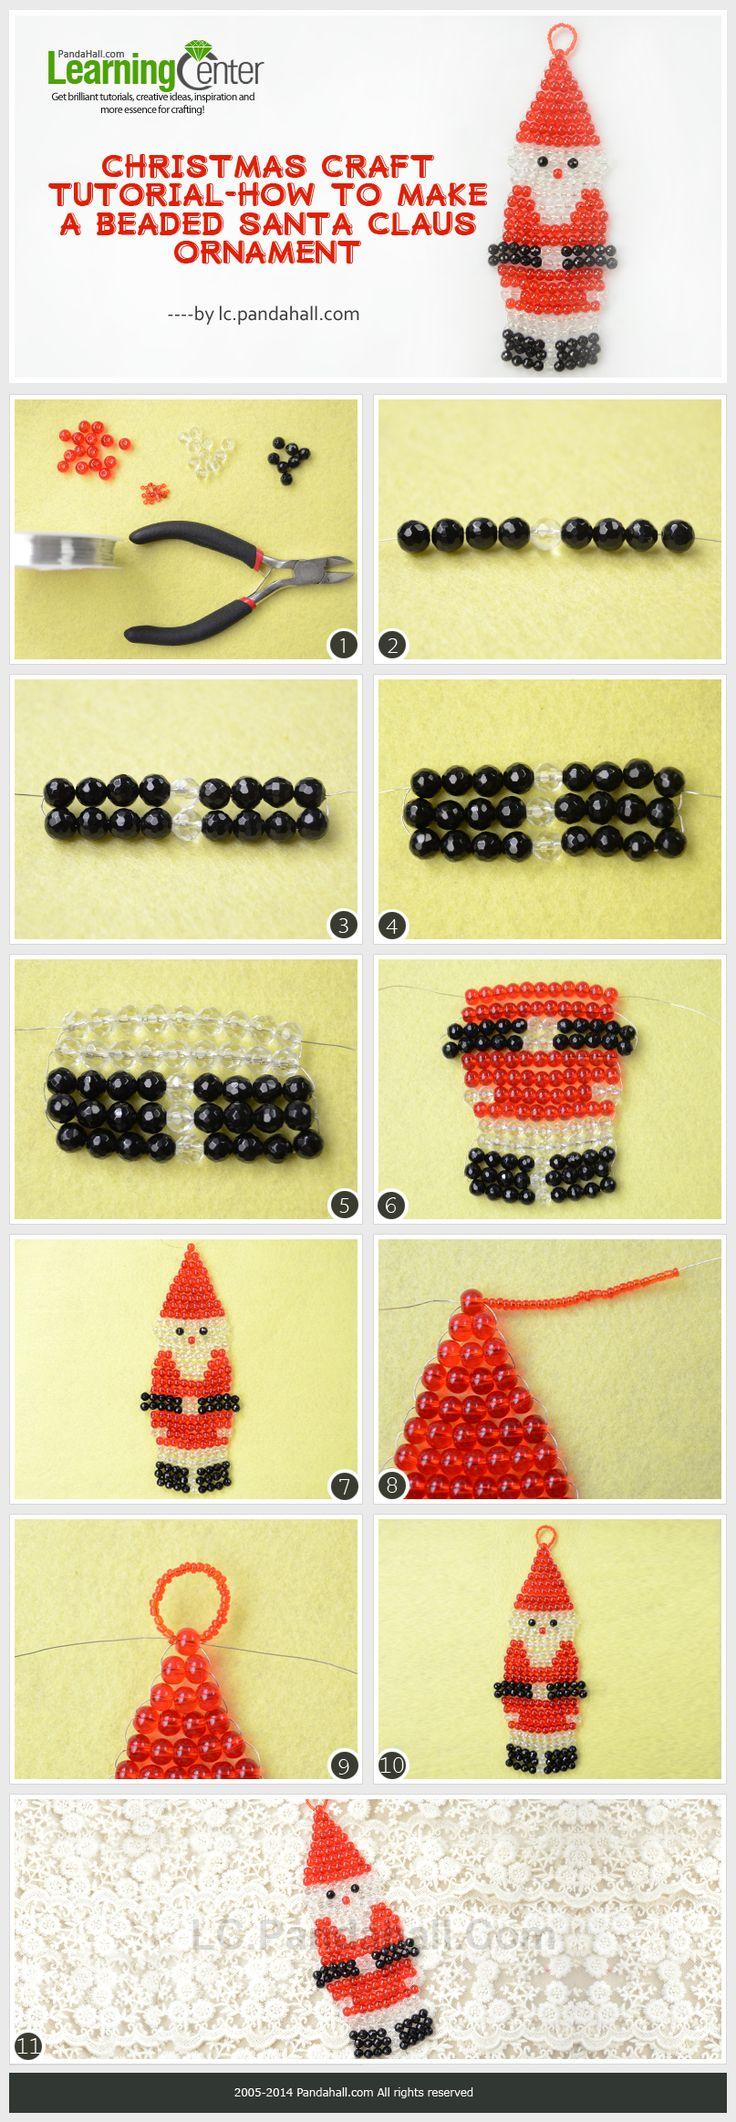 Christmas Craft Tutorial: How to Make a Beaded Santa Claus Ornament